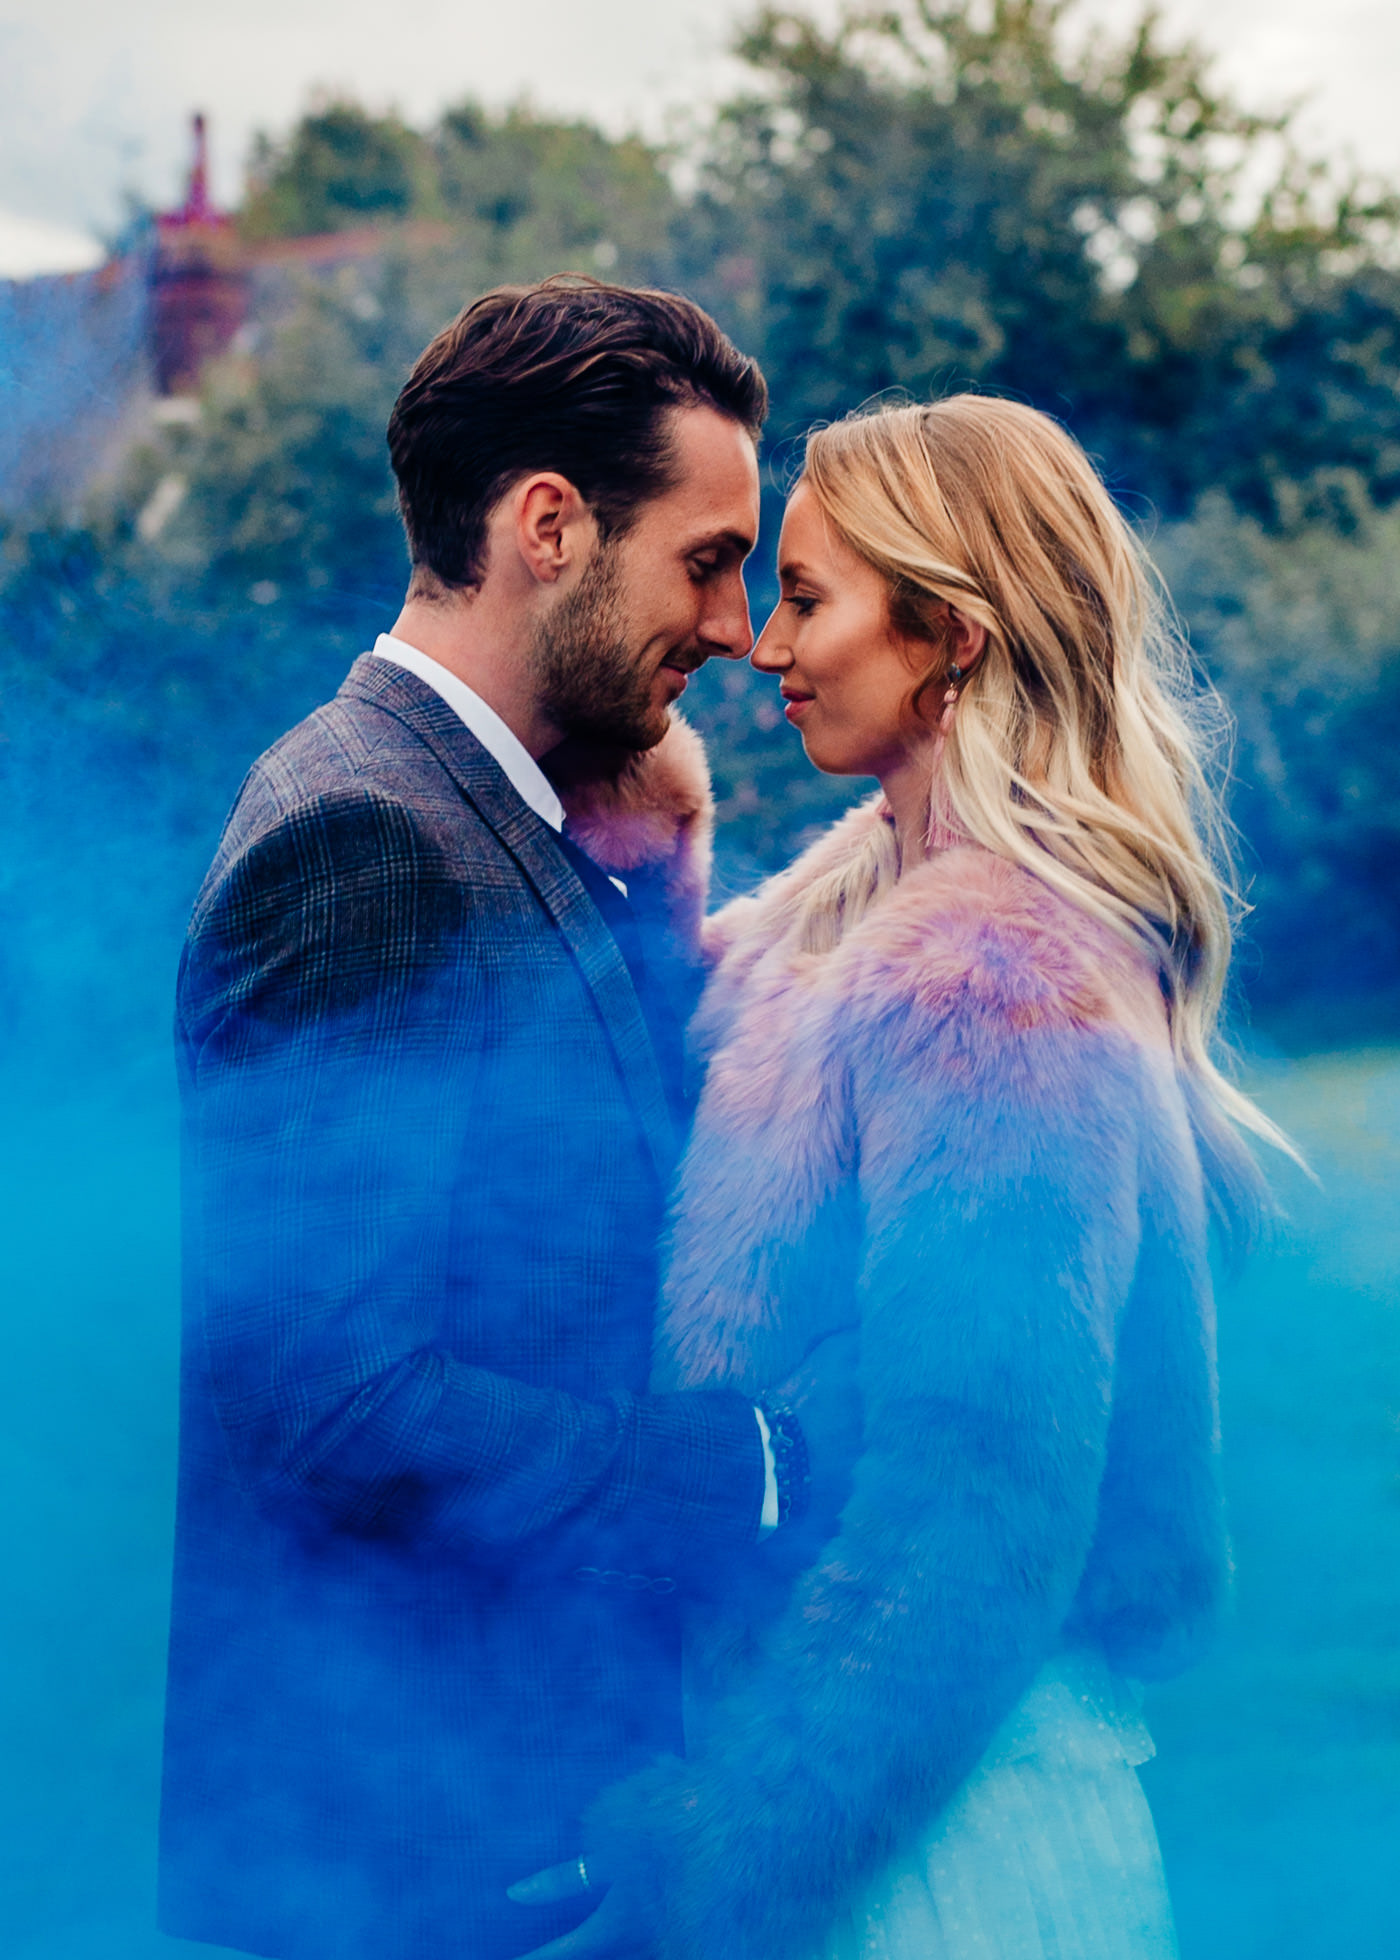 KENT-ELOPEMENT-wedding-photographer-UK-London-Epic-Love-Story-001-2